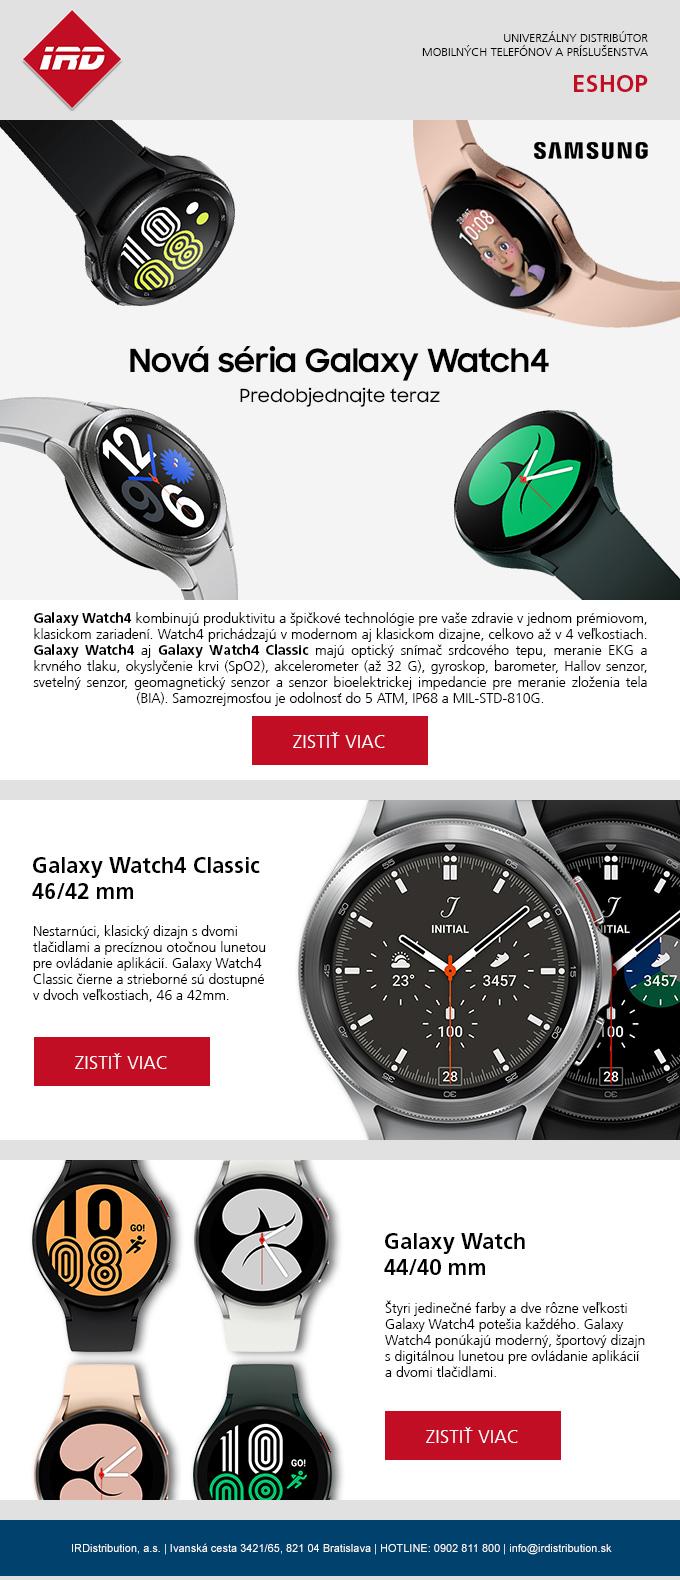 nl-ird-samsung-galaxy-watch4-preorder